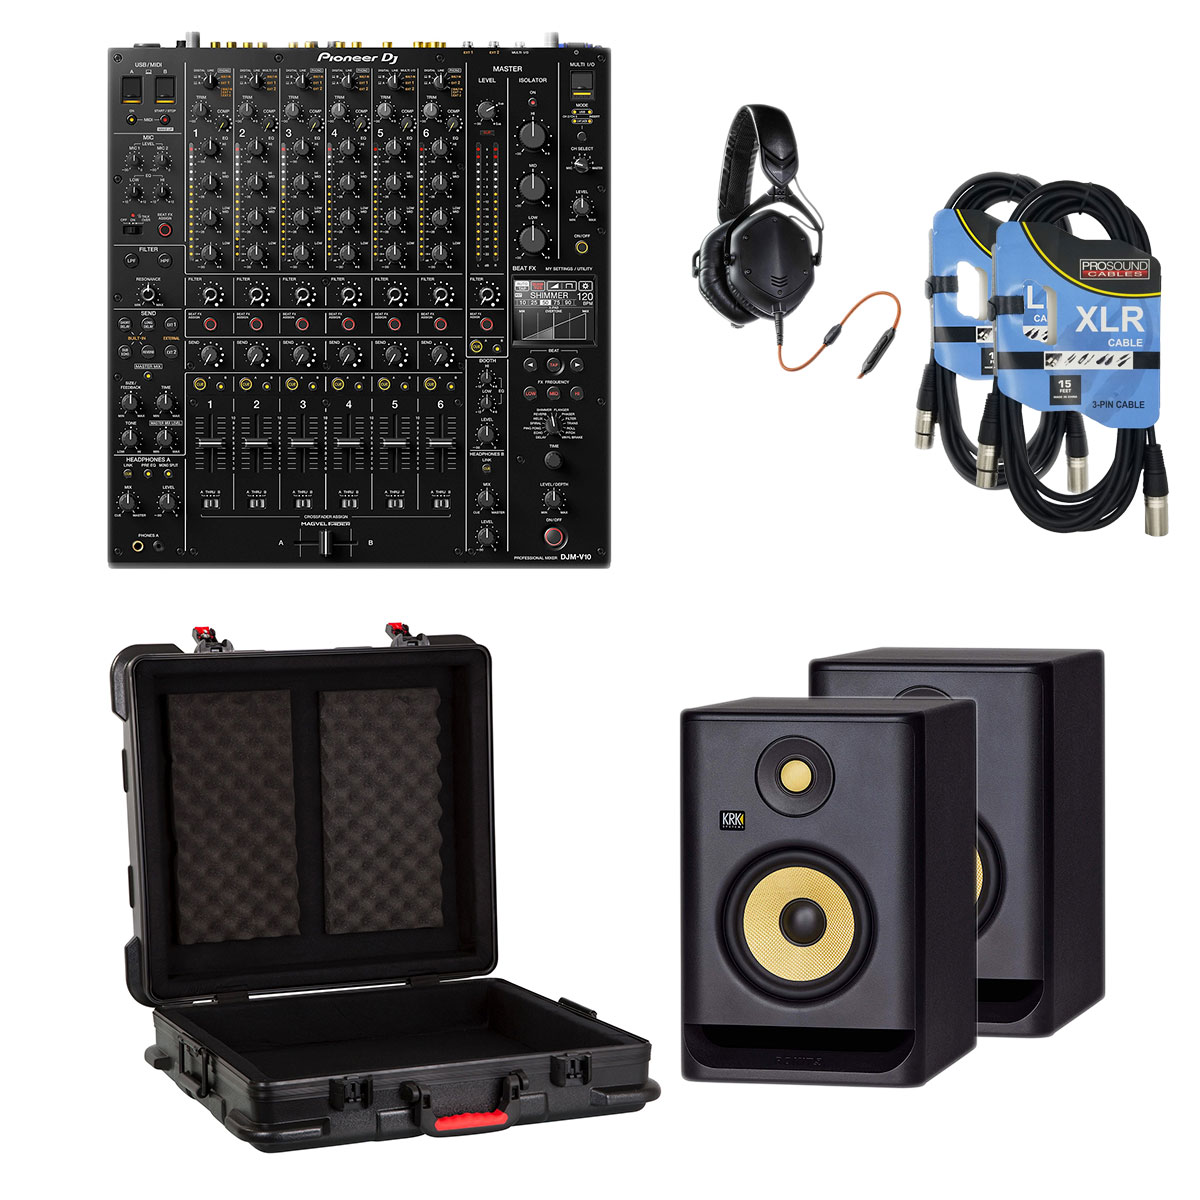 2-Pioneer-DJ-DJM-V10-6-Channel-GTSA-MIX192106-V-Moda-M100-KRK-RP5G4-Pair-XLR-Cables-3518-1